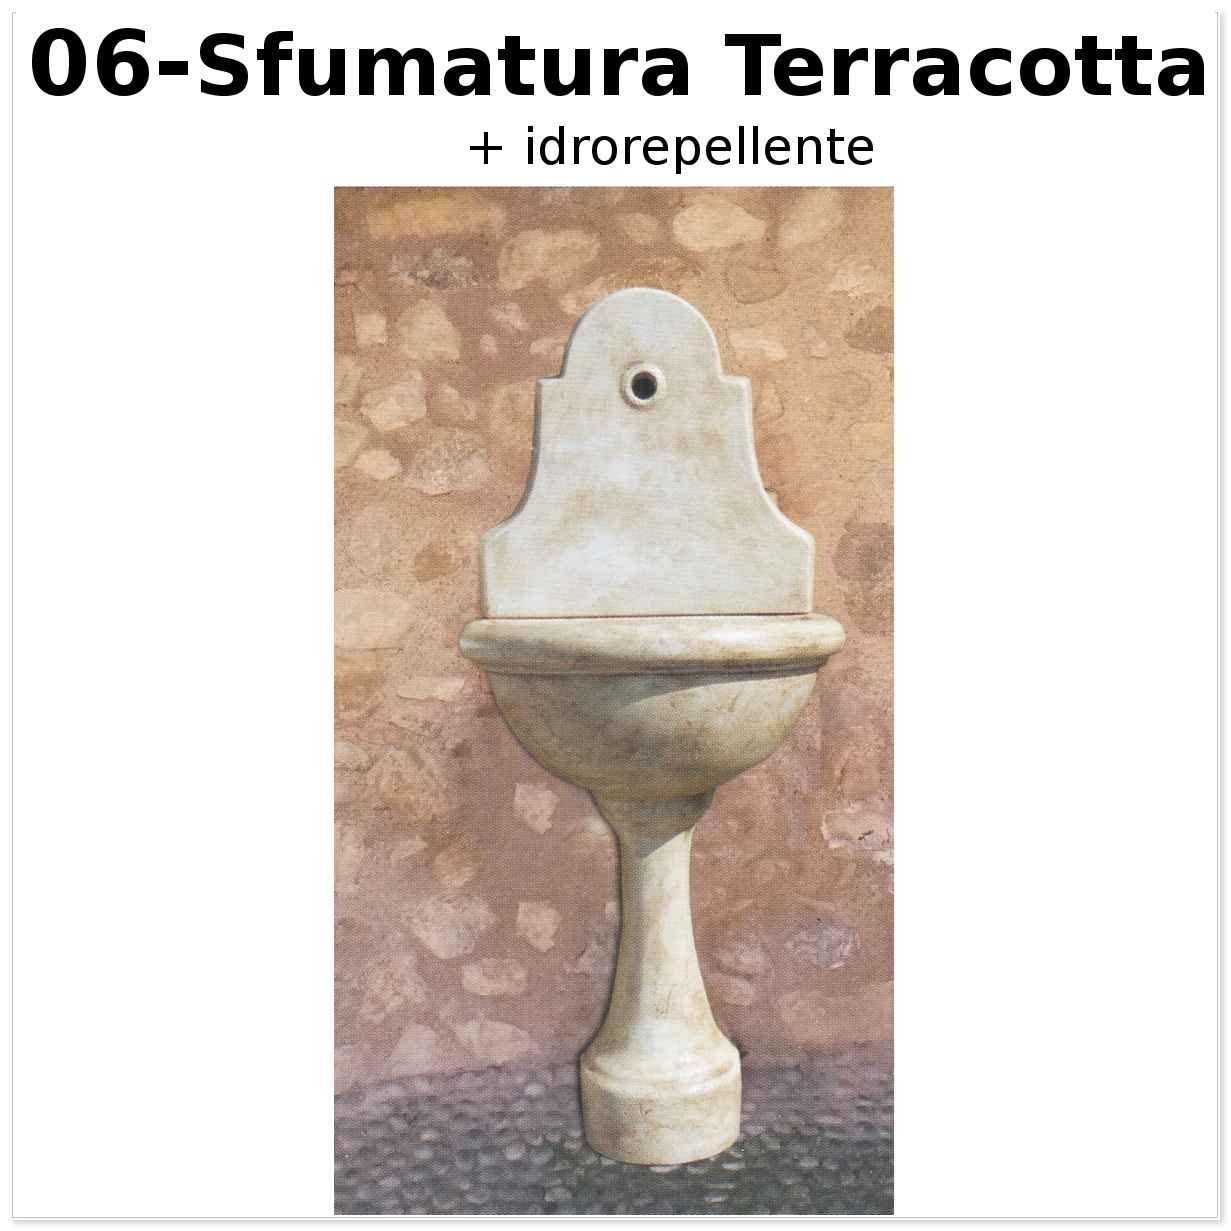 FONTANA A MURO STILE 900 CM53 120H SFUMATURA TERRACOTTA